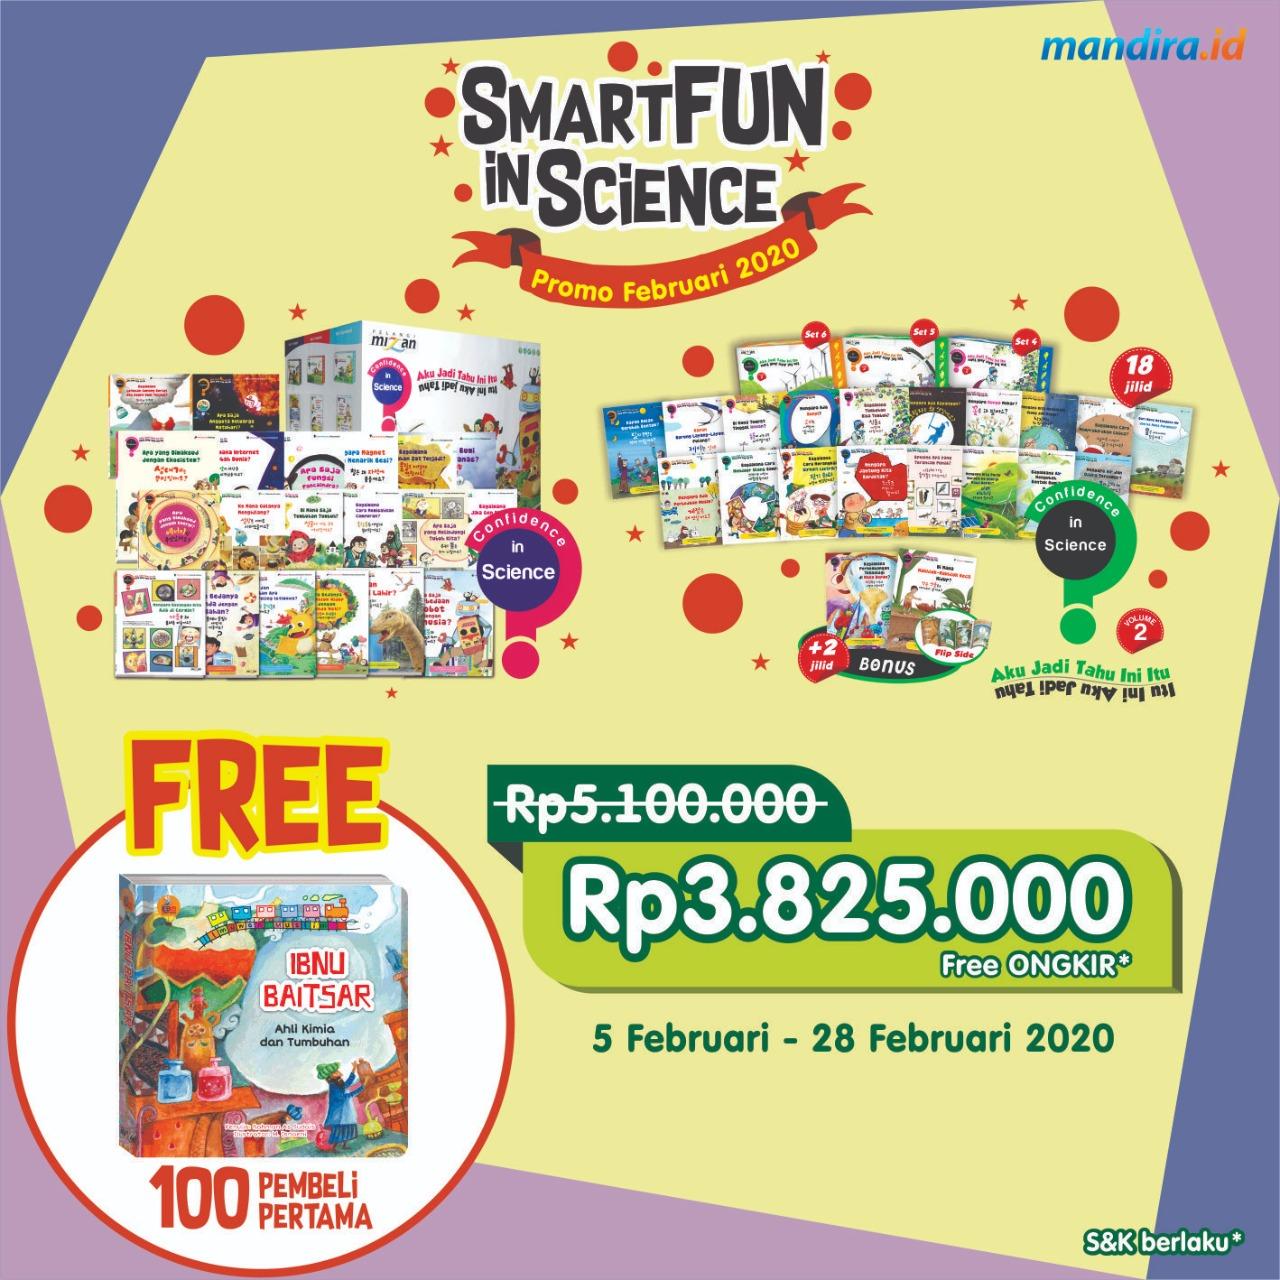 CIS 1 + CIS 2 SMARTFUN FEB 20 (FREE SCIENCE BOOK)